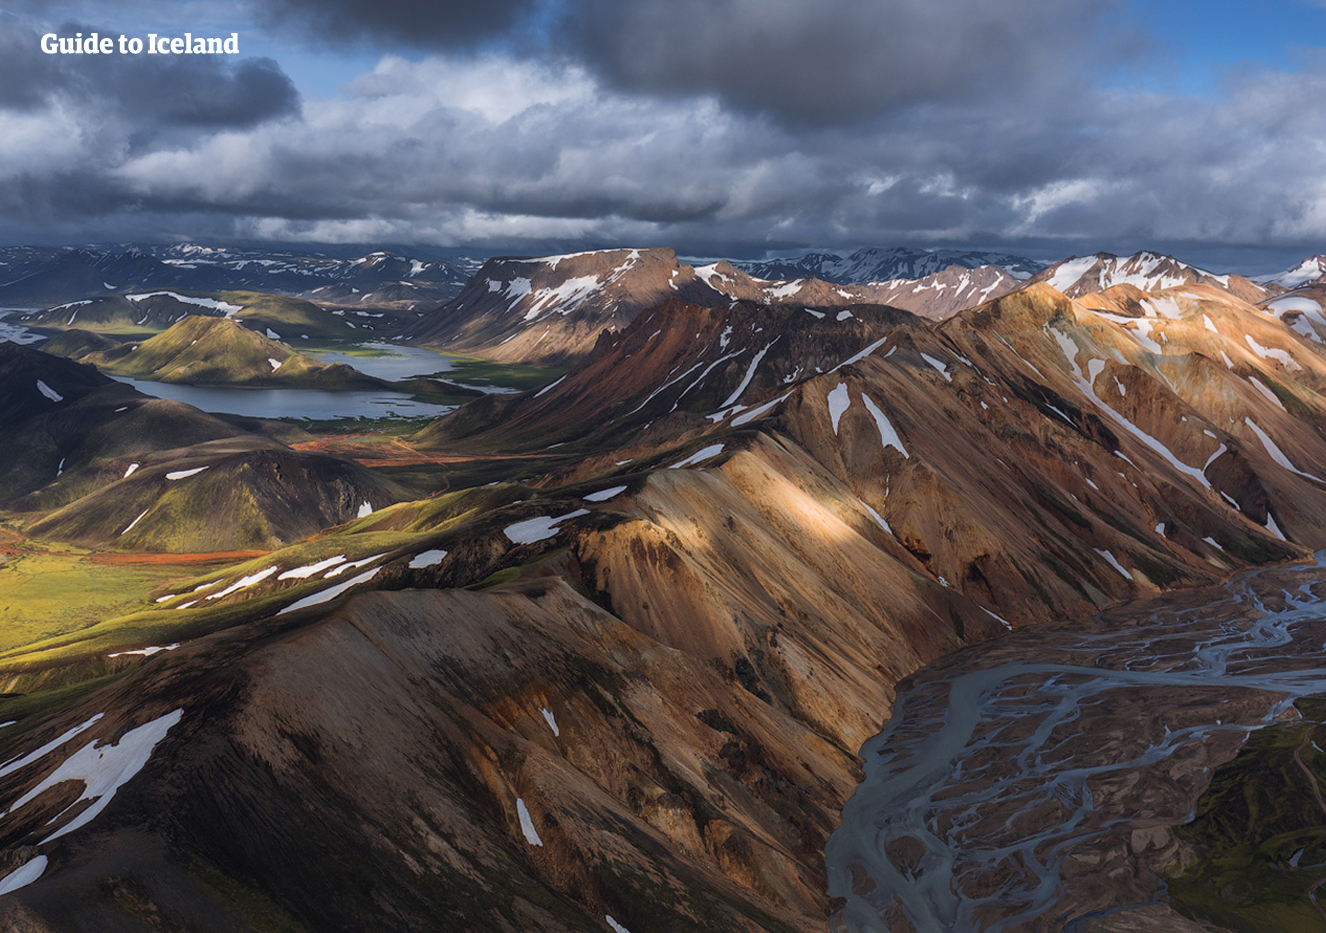 Scenic 5 Day Road Trip Adventure Through Iceland's South Coast, Landmannalaugar & Highlands - day 3